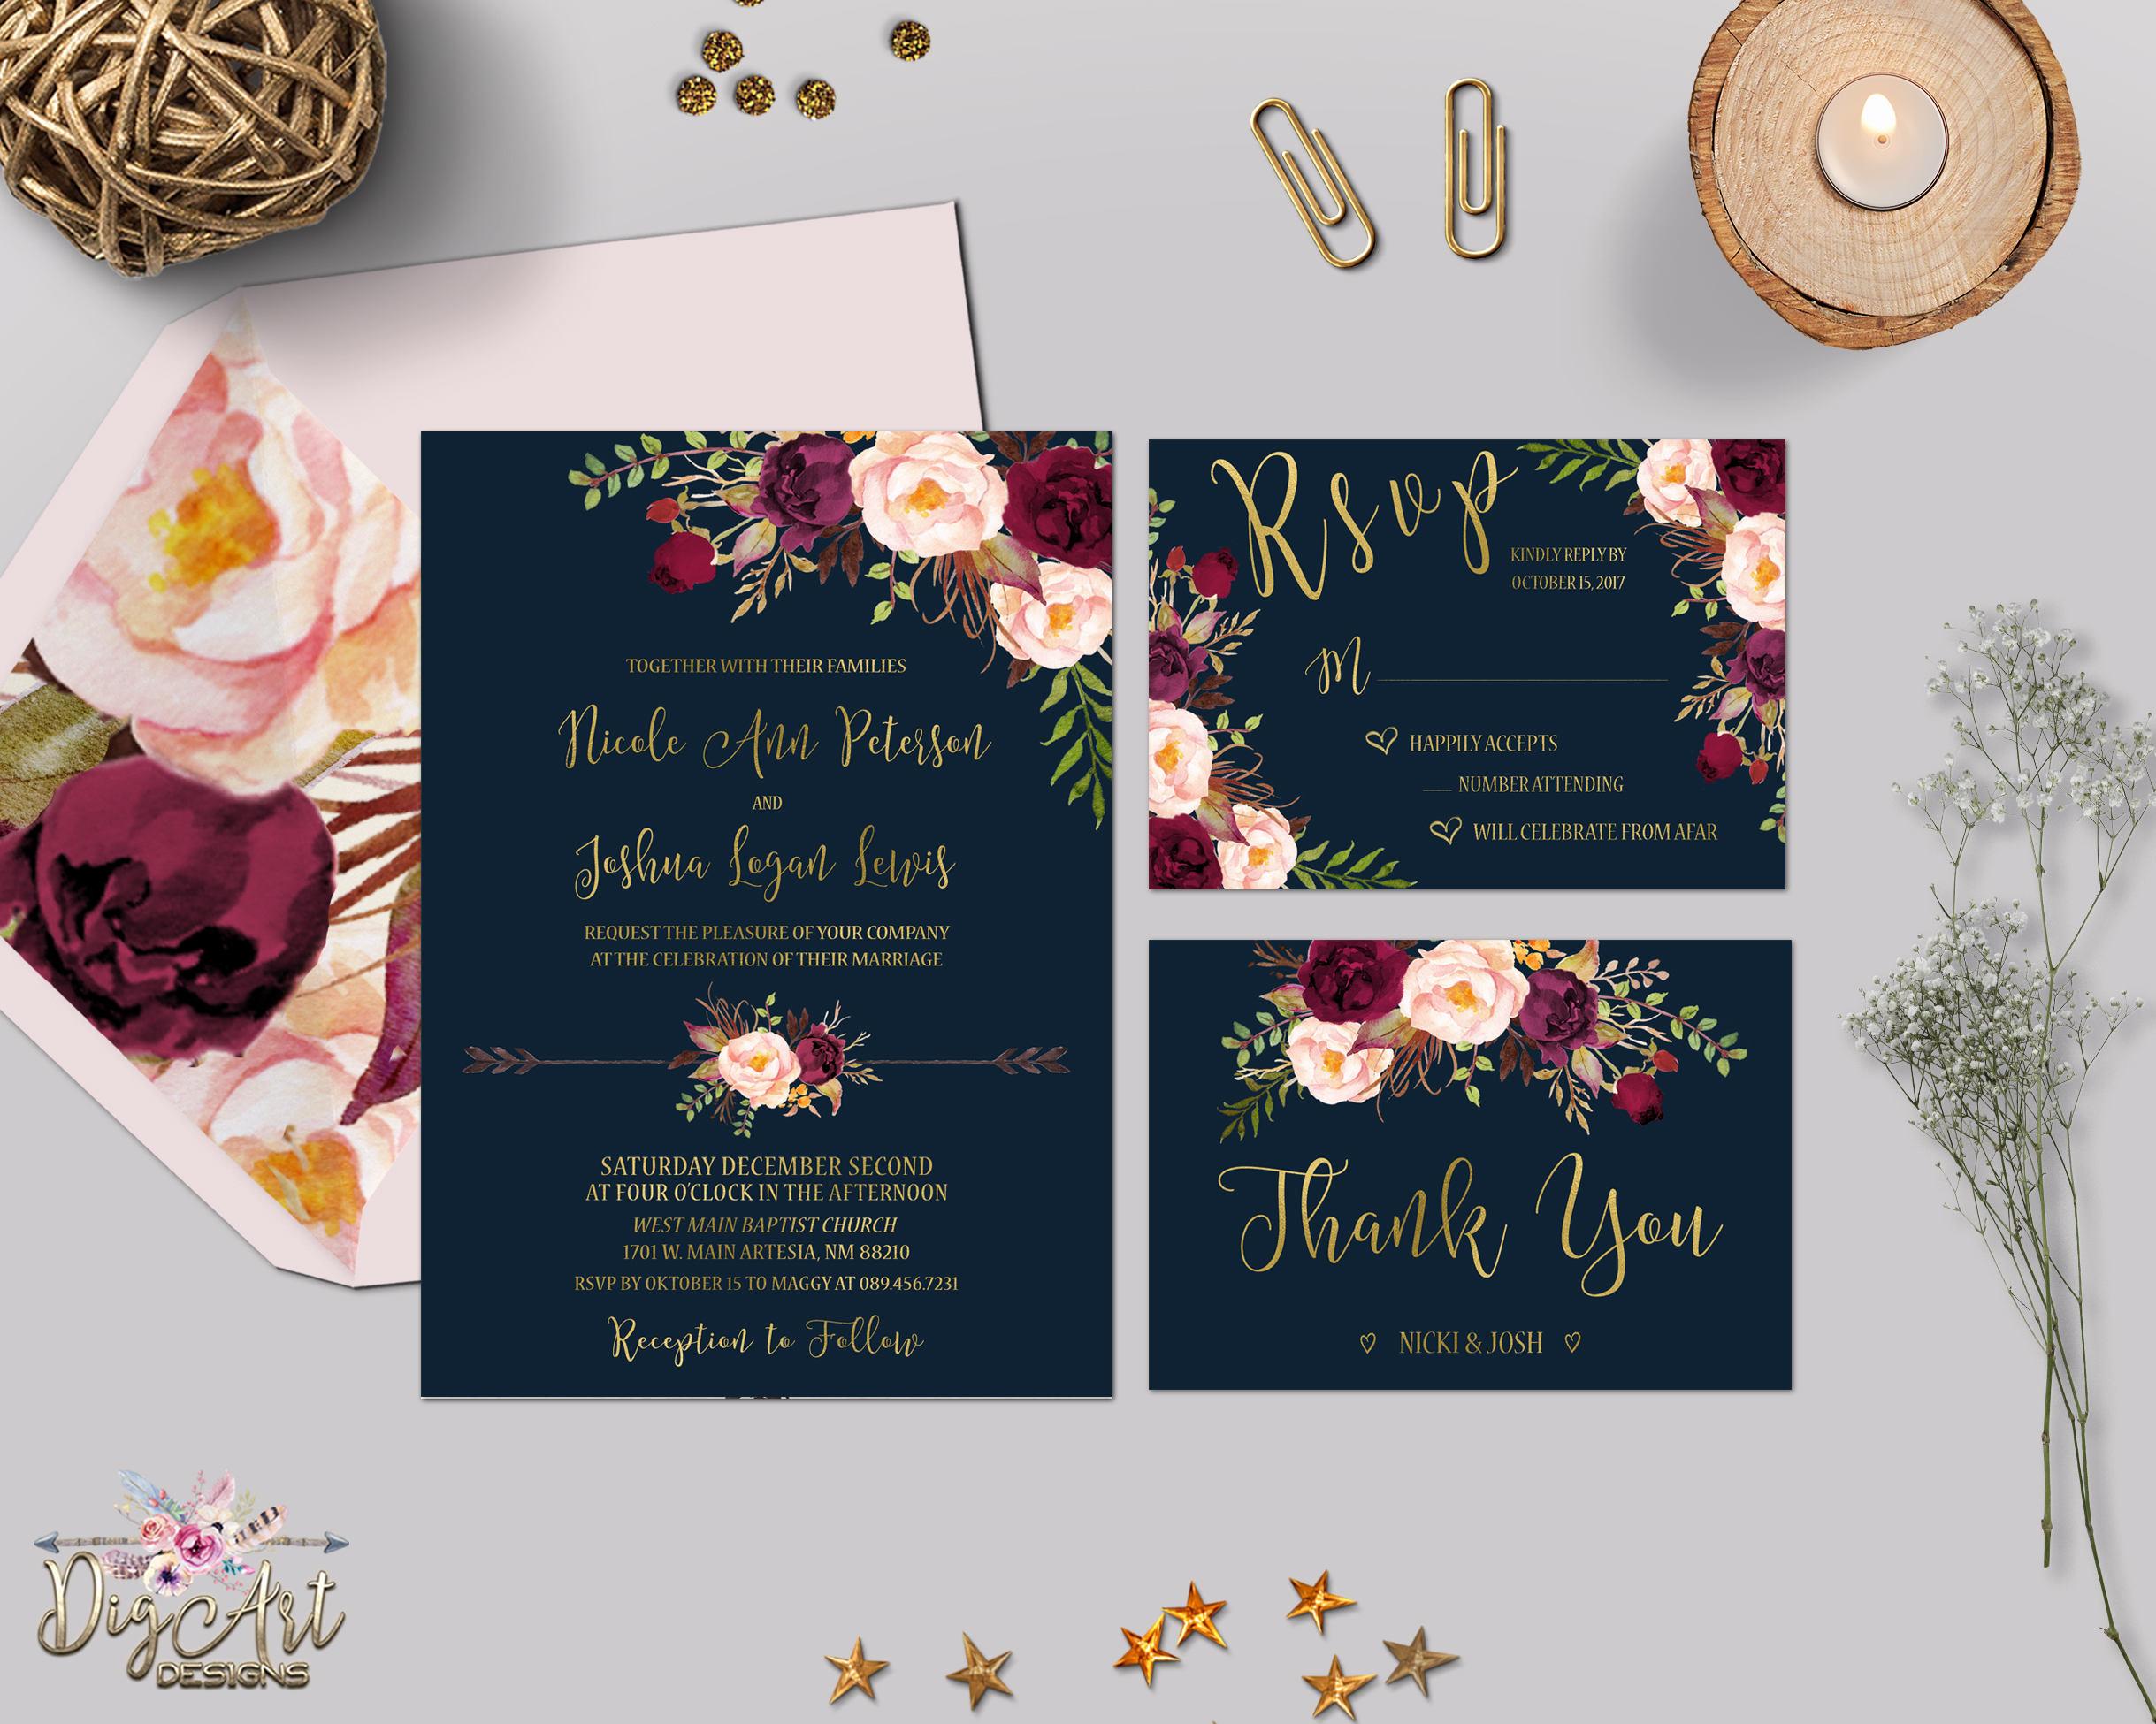 Navy And Gold Wedding Invitations: Navy Burgundy Gold Wedding Invitation Printable Boho Floral